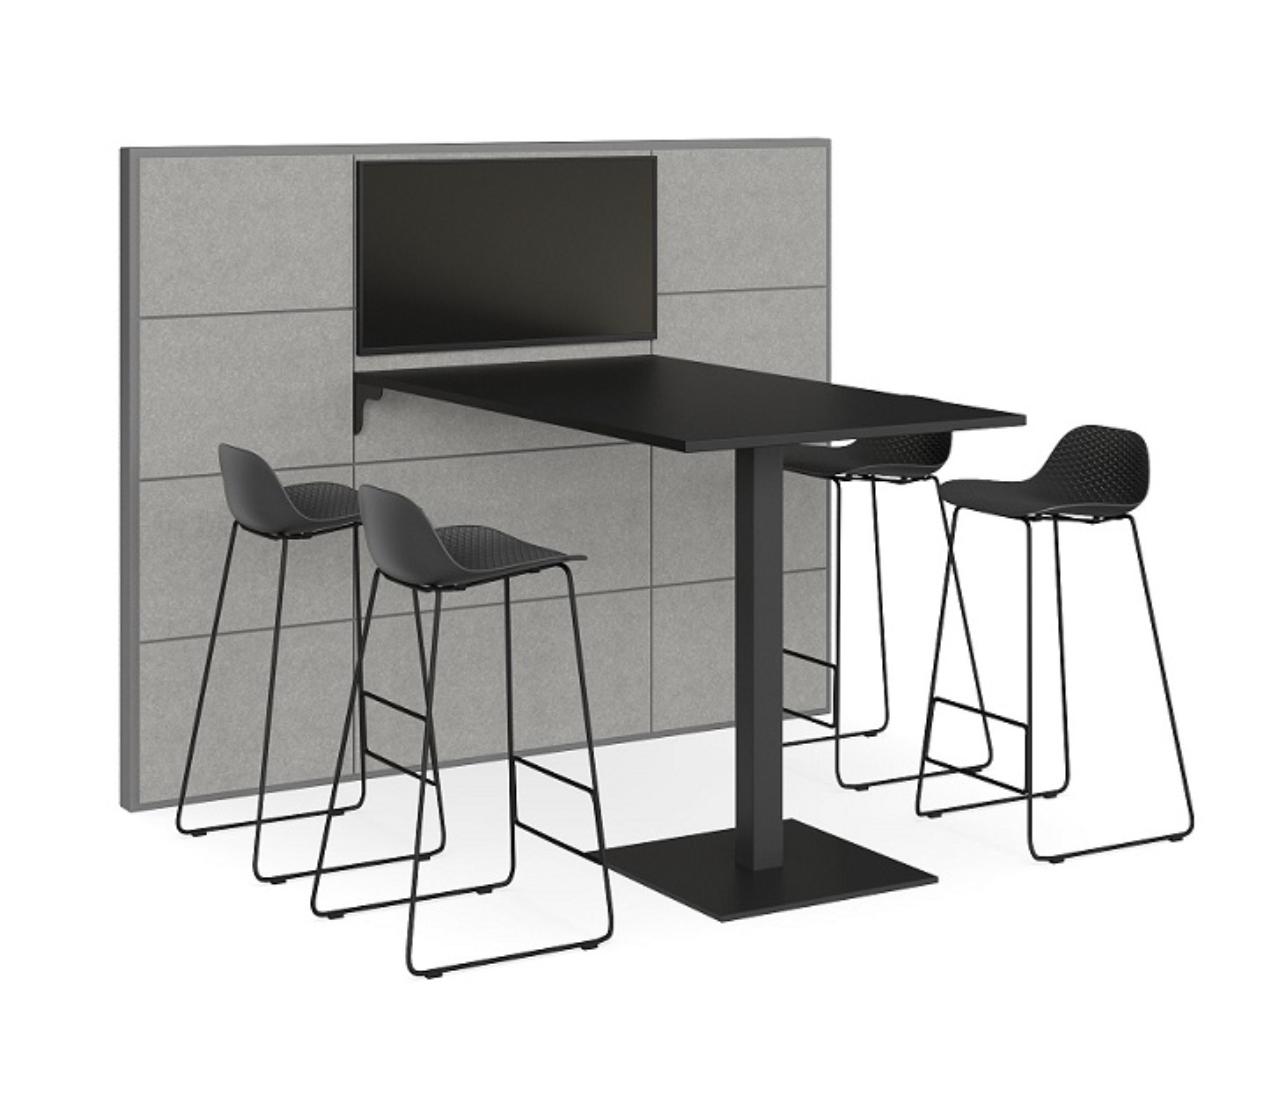 V8 media wall + collaboration table